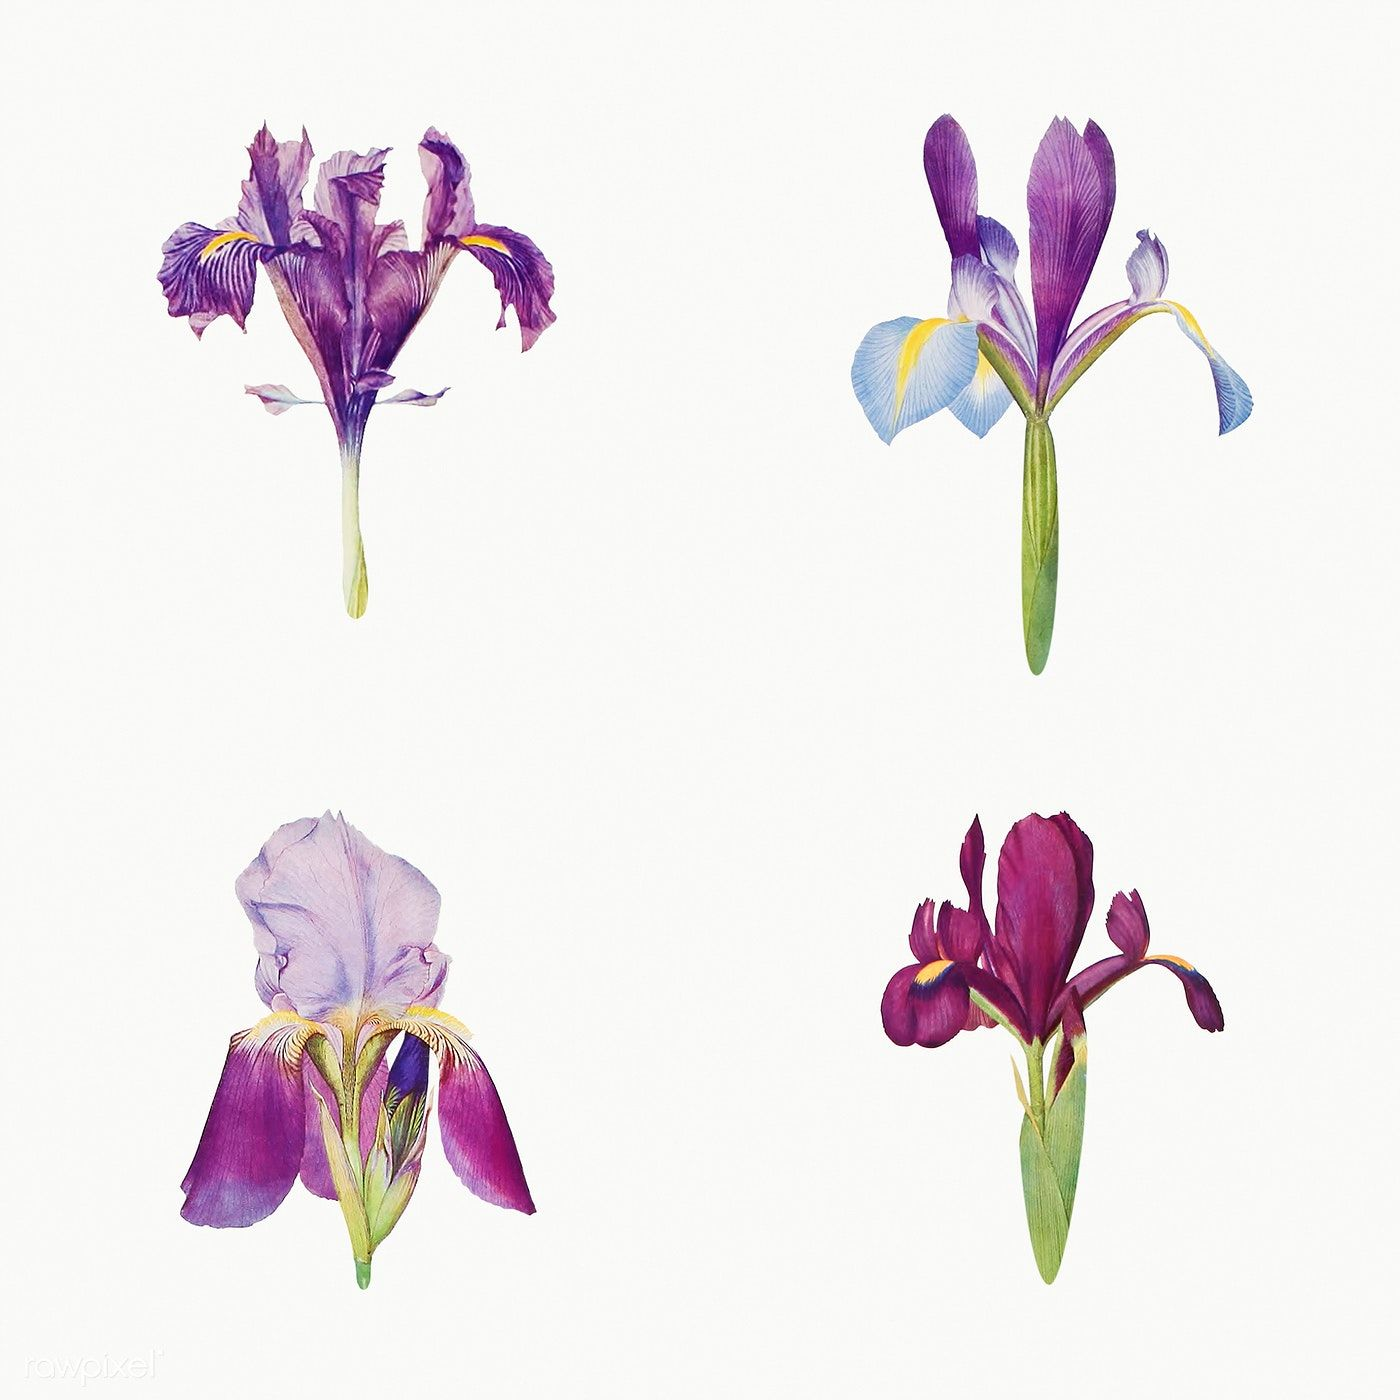 Download Premium Illustration Of Vintage Iris Flower Illustration In 2020 Flower Illustration Iris Flowers Flower Drawing